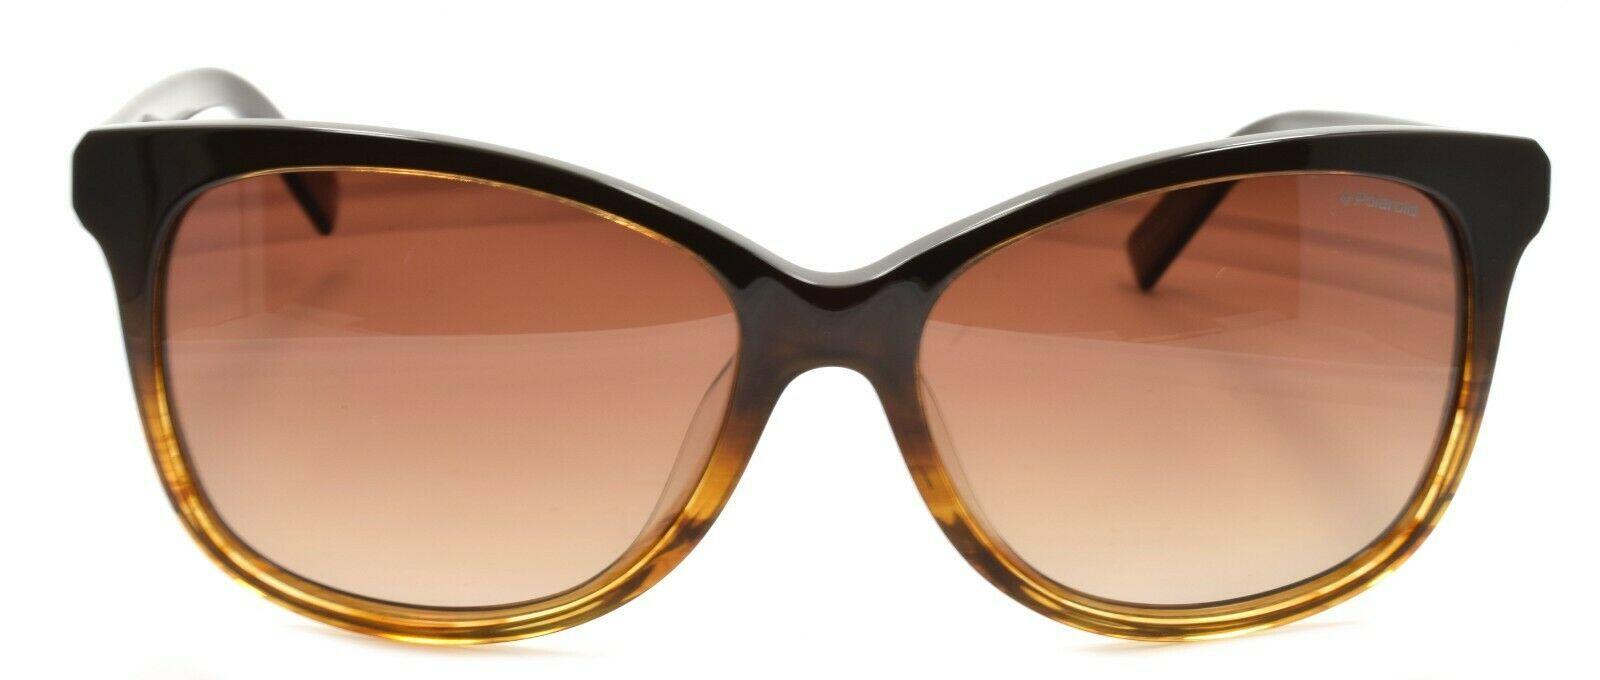 Polaroid PLD 4022/S NOW X3 Women's Sunglasses Polarized 57-16-135 Brown Honey